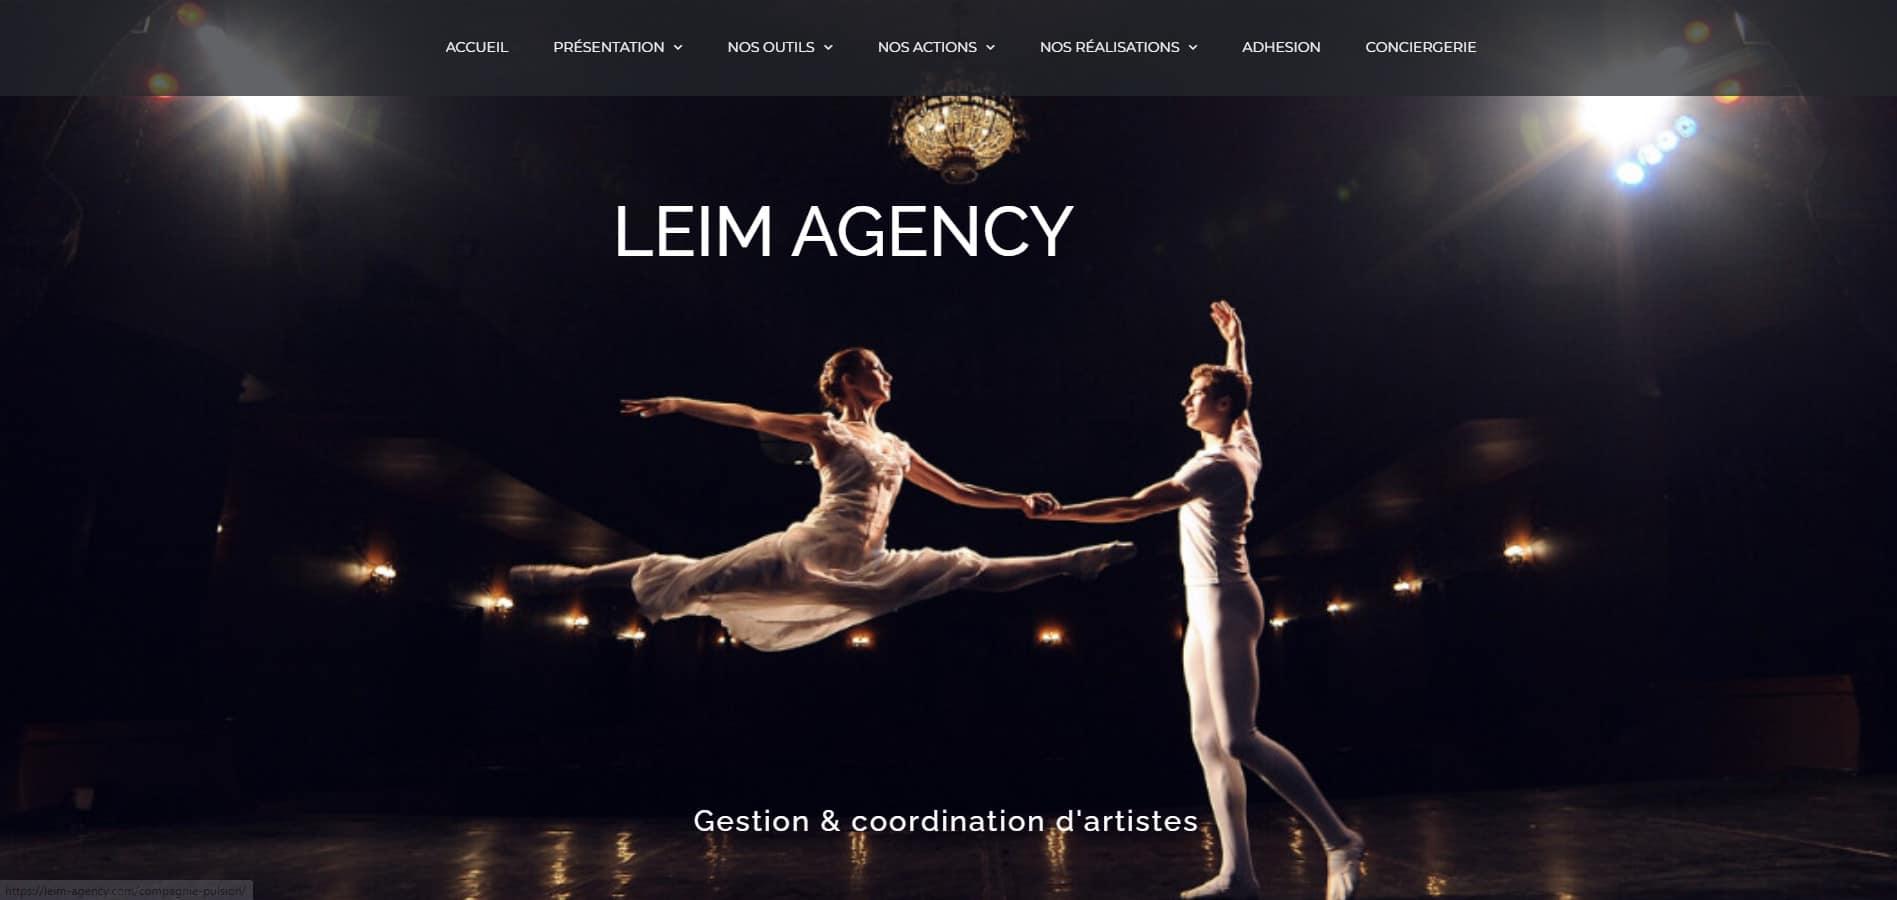 leim agency